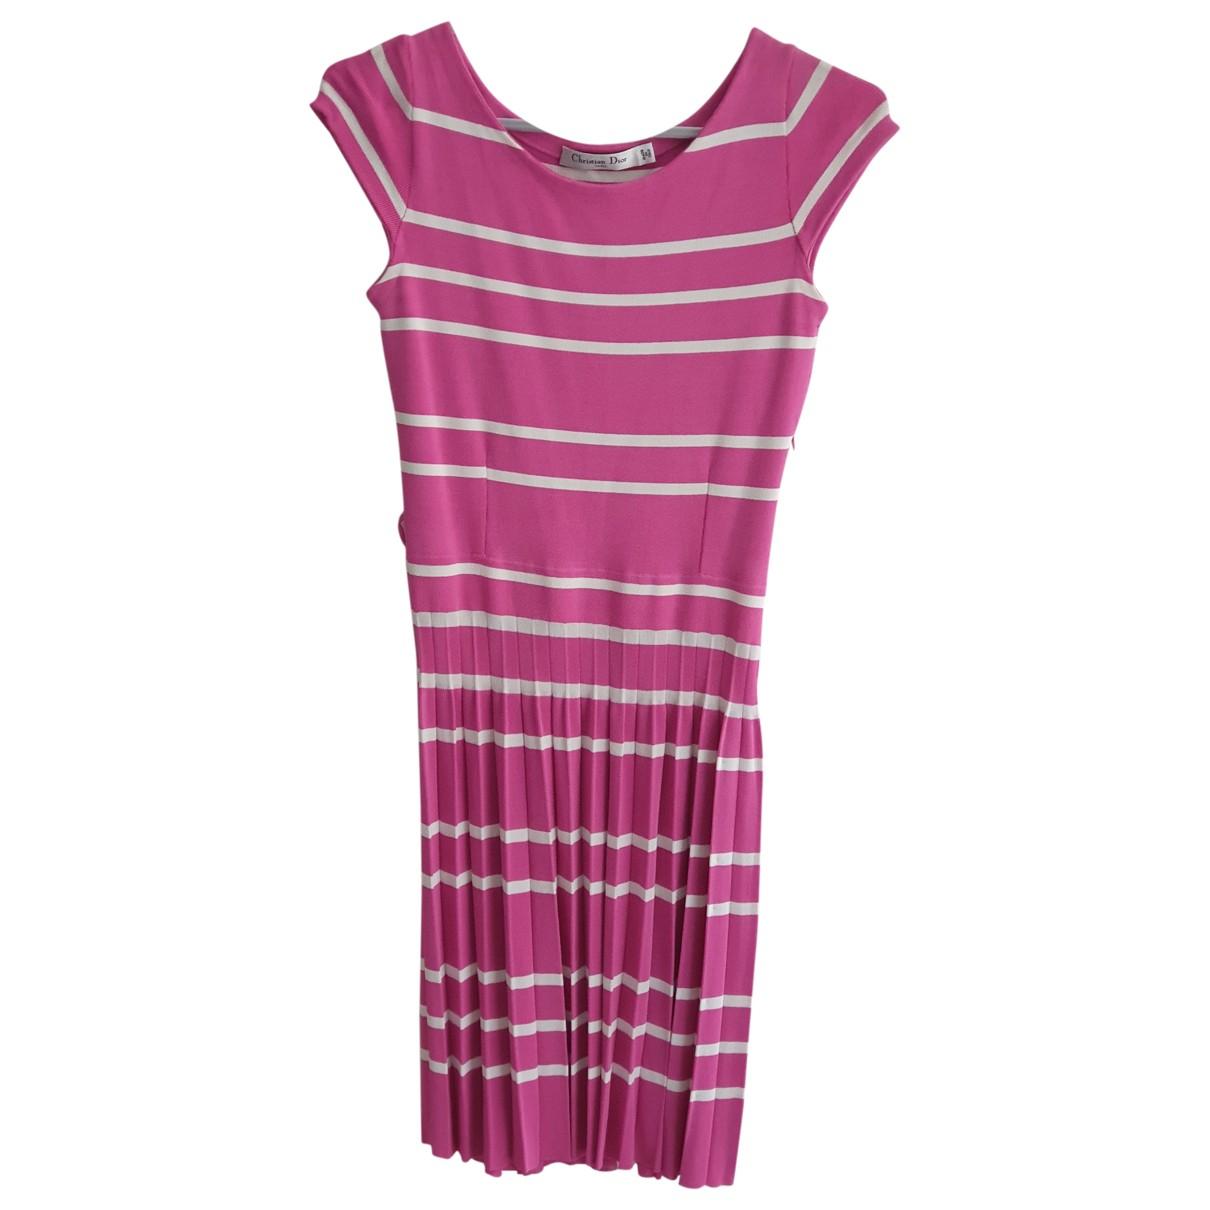 Dior \N Pink dress for Women 38 FR